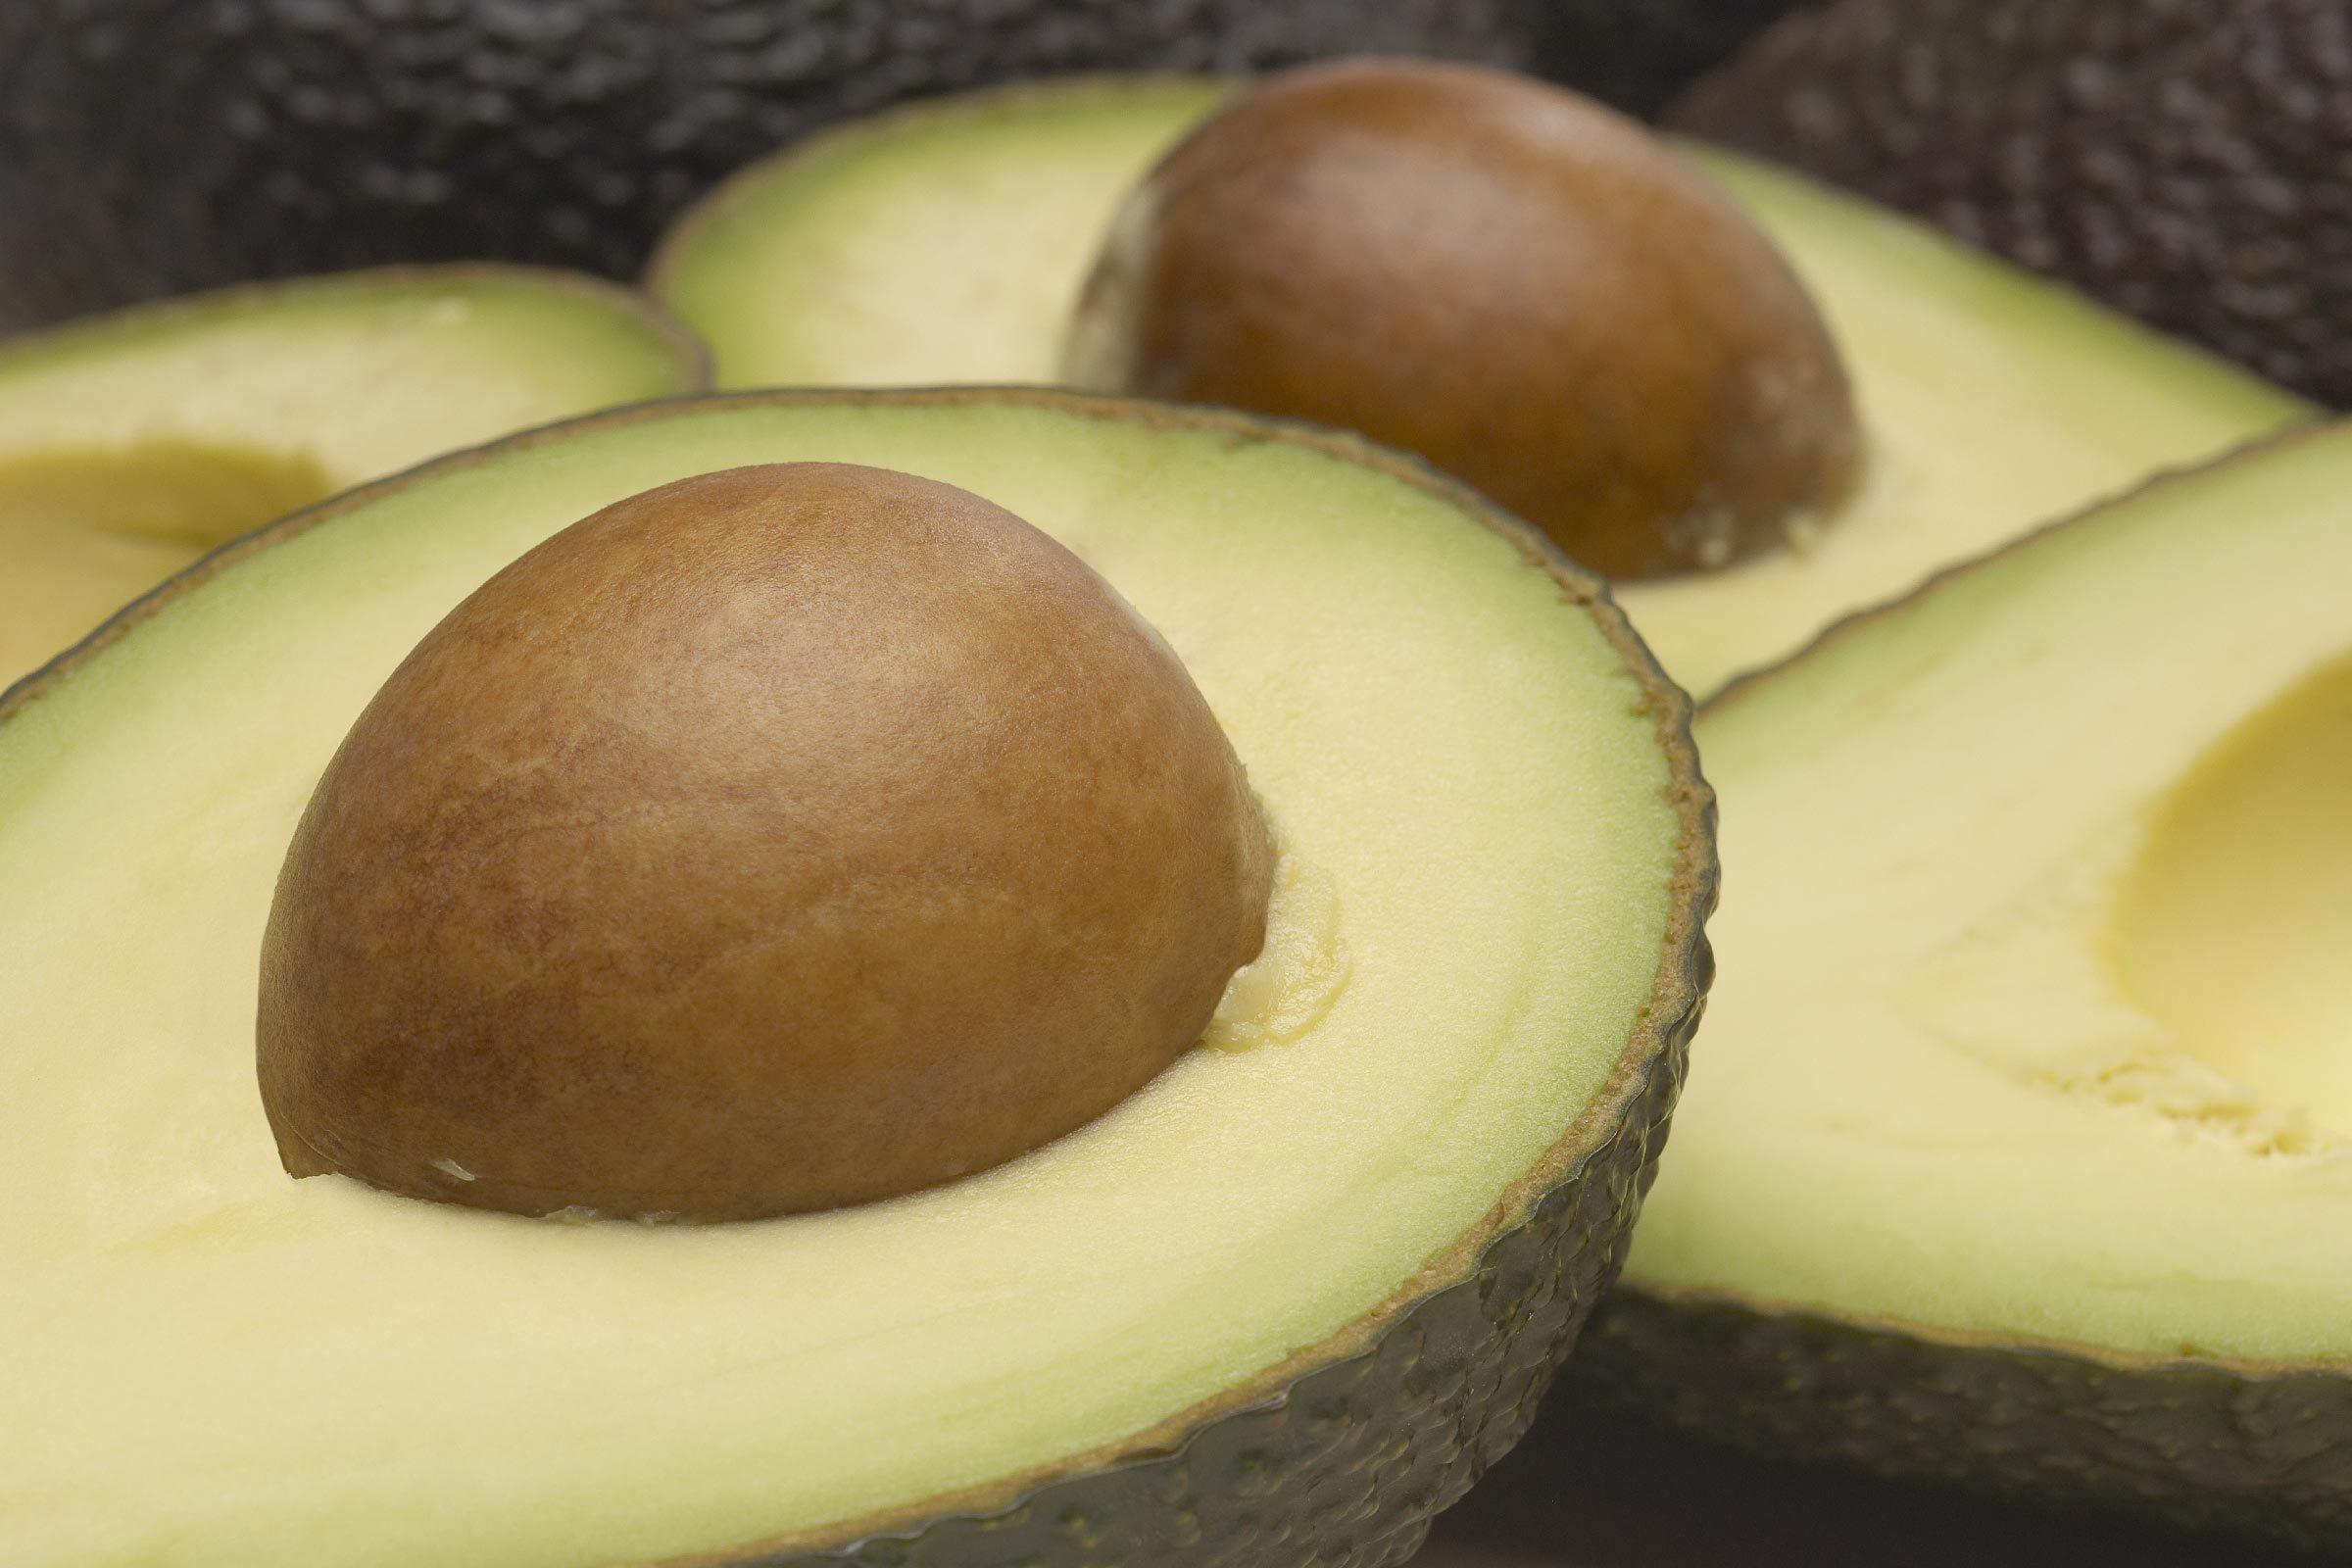 Studio of halved avocados